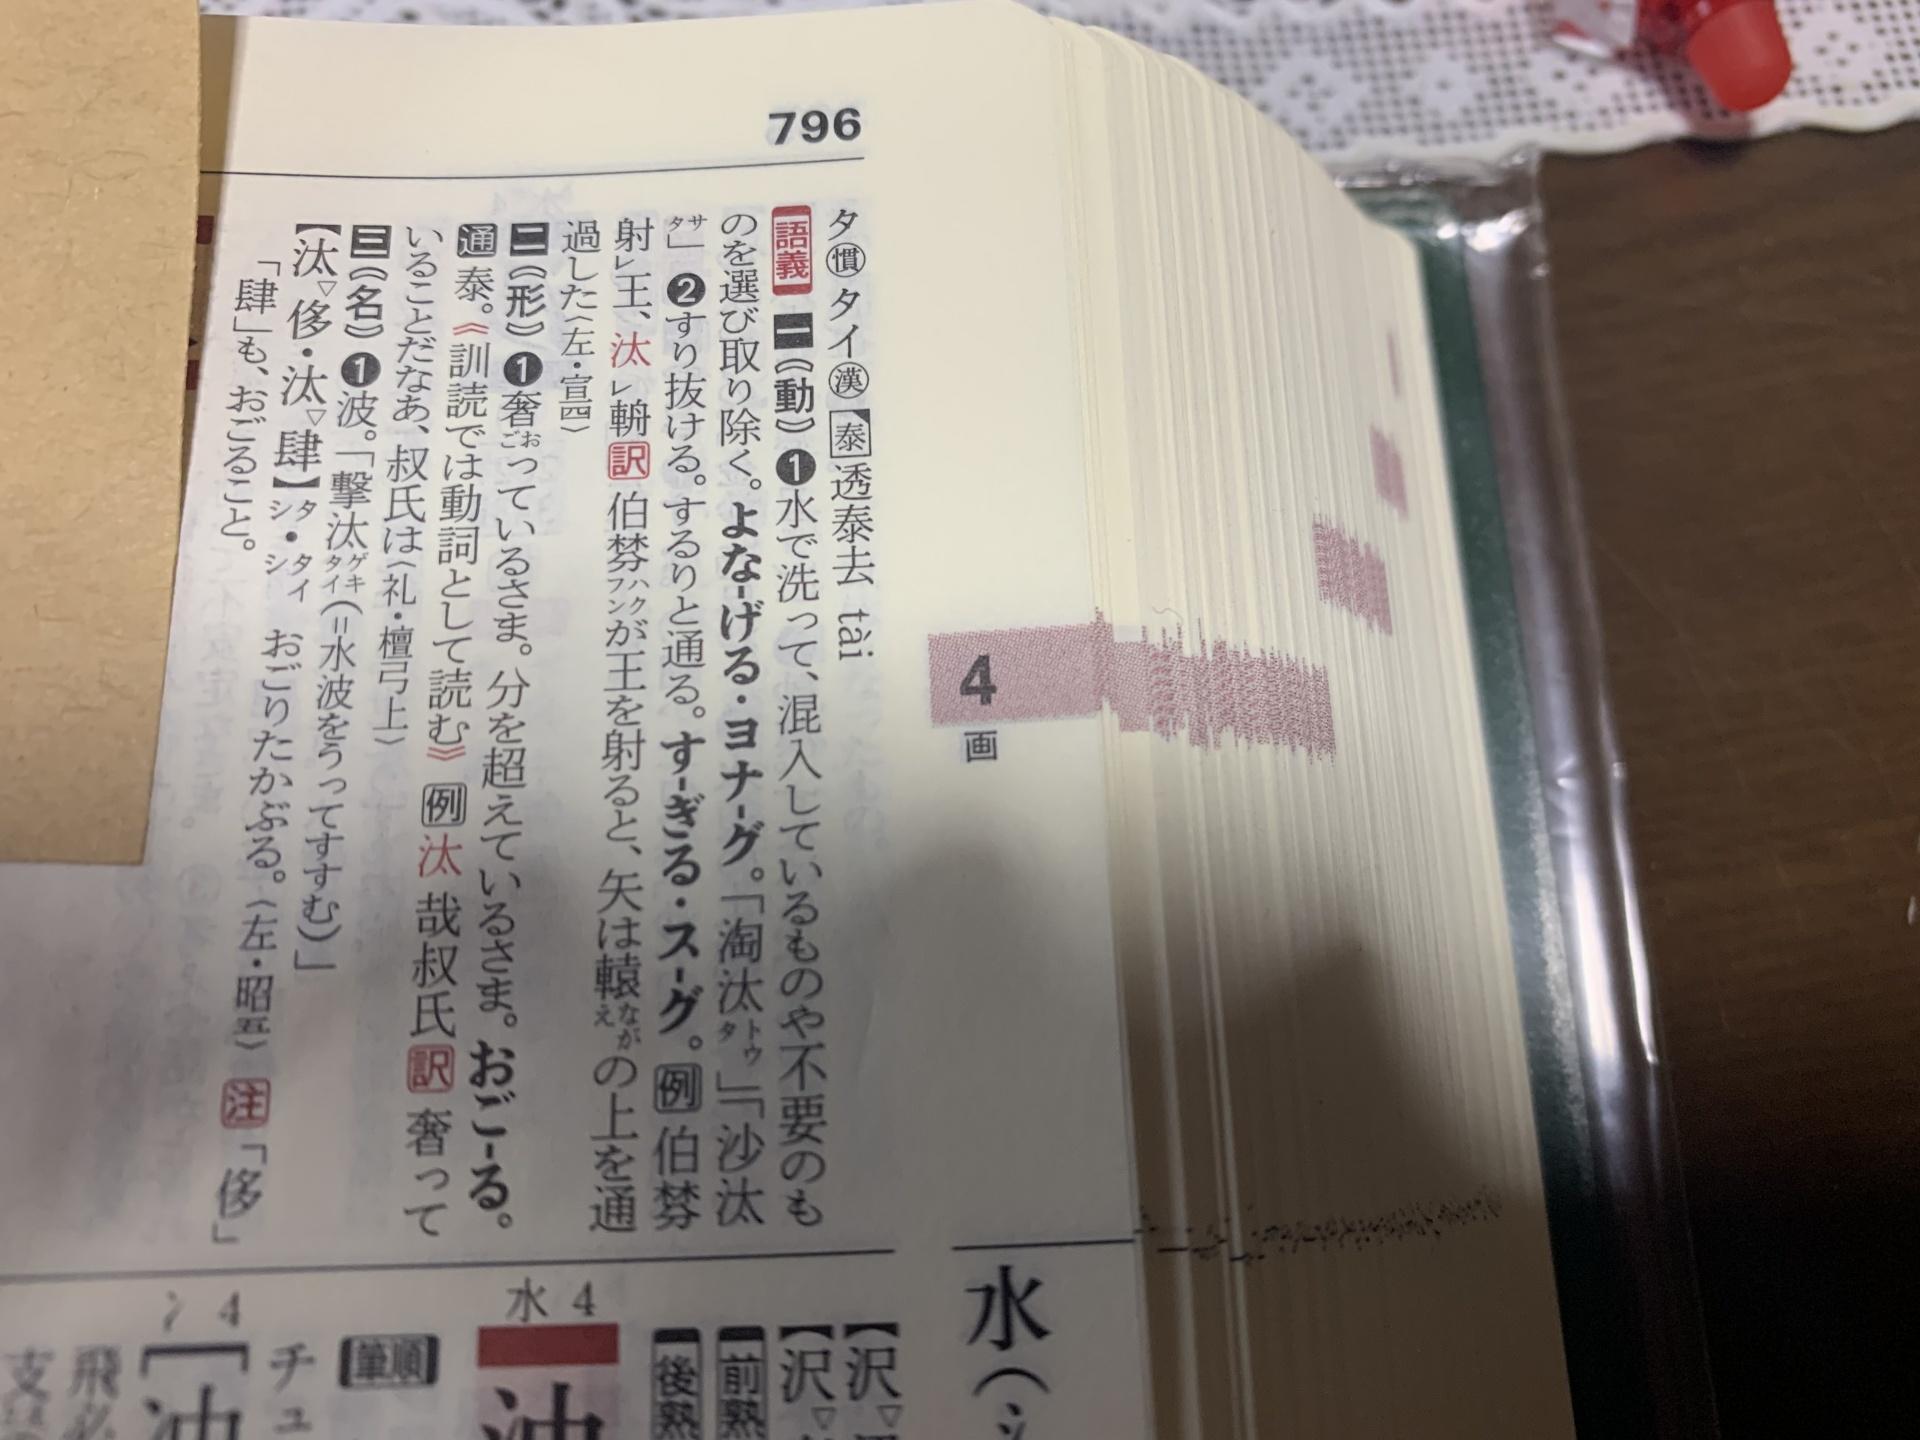 77F0F2A1-8C71-44CC-933C-BA5733B2CCC5